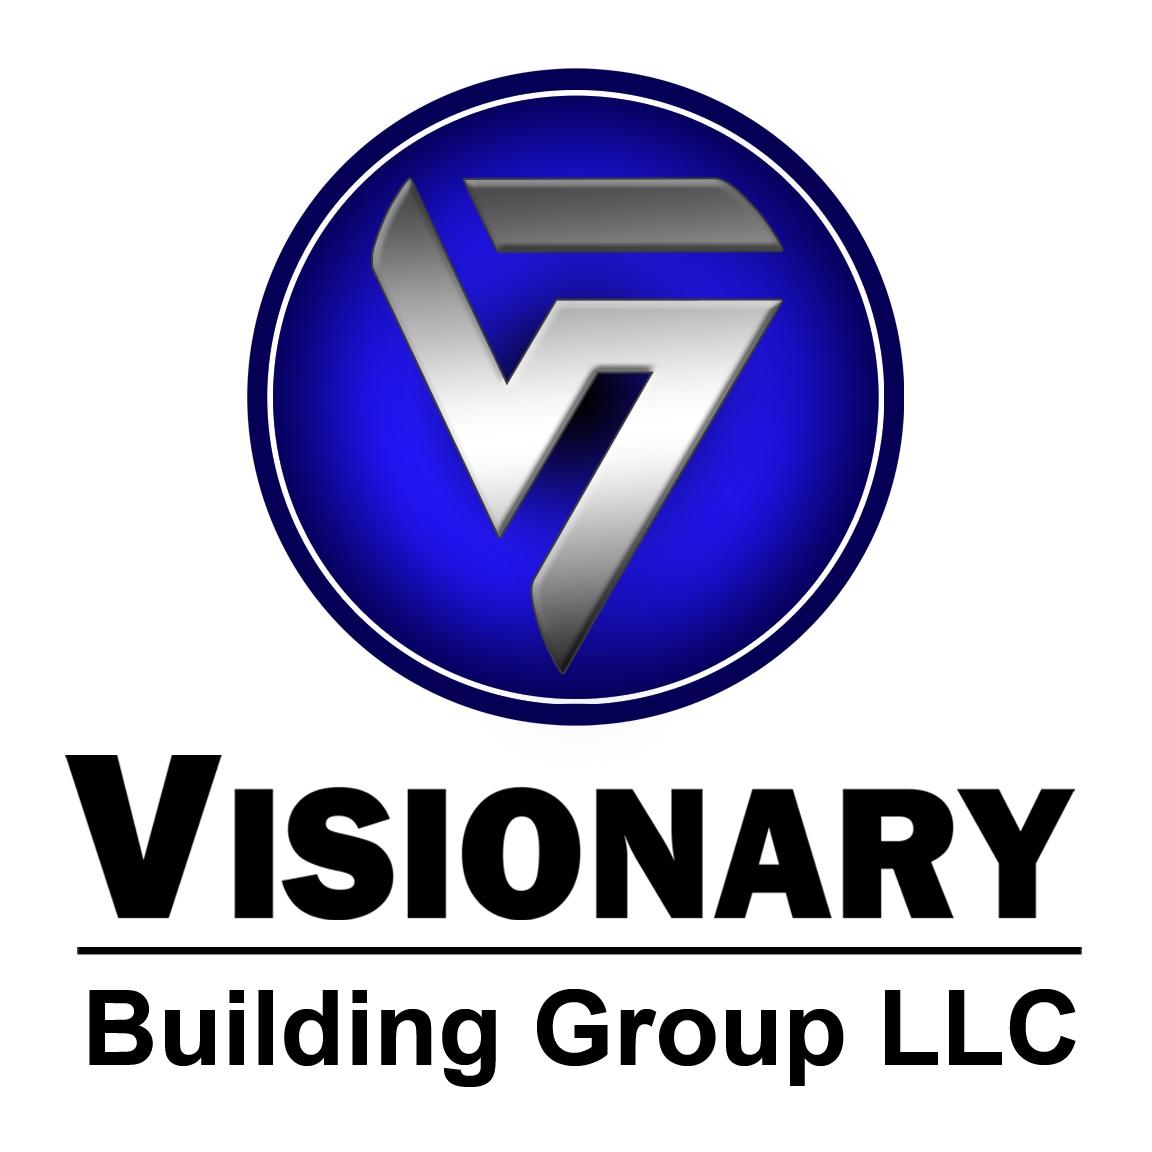 Visionary Building Group LLC logo